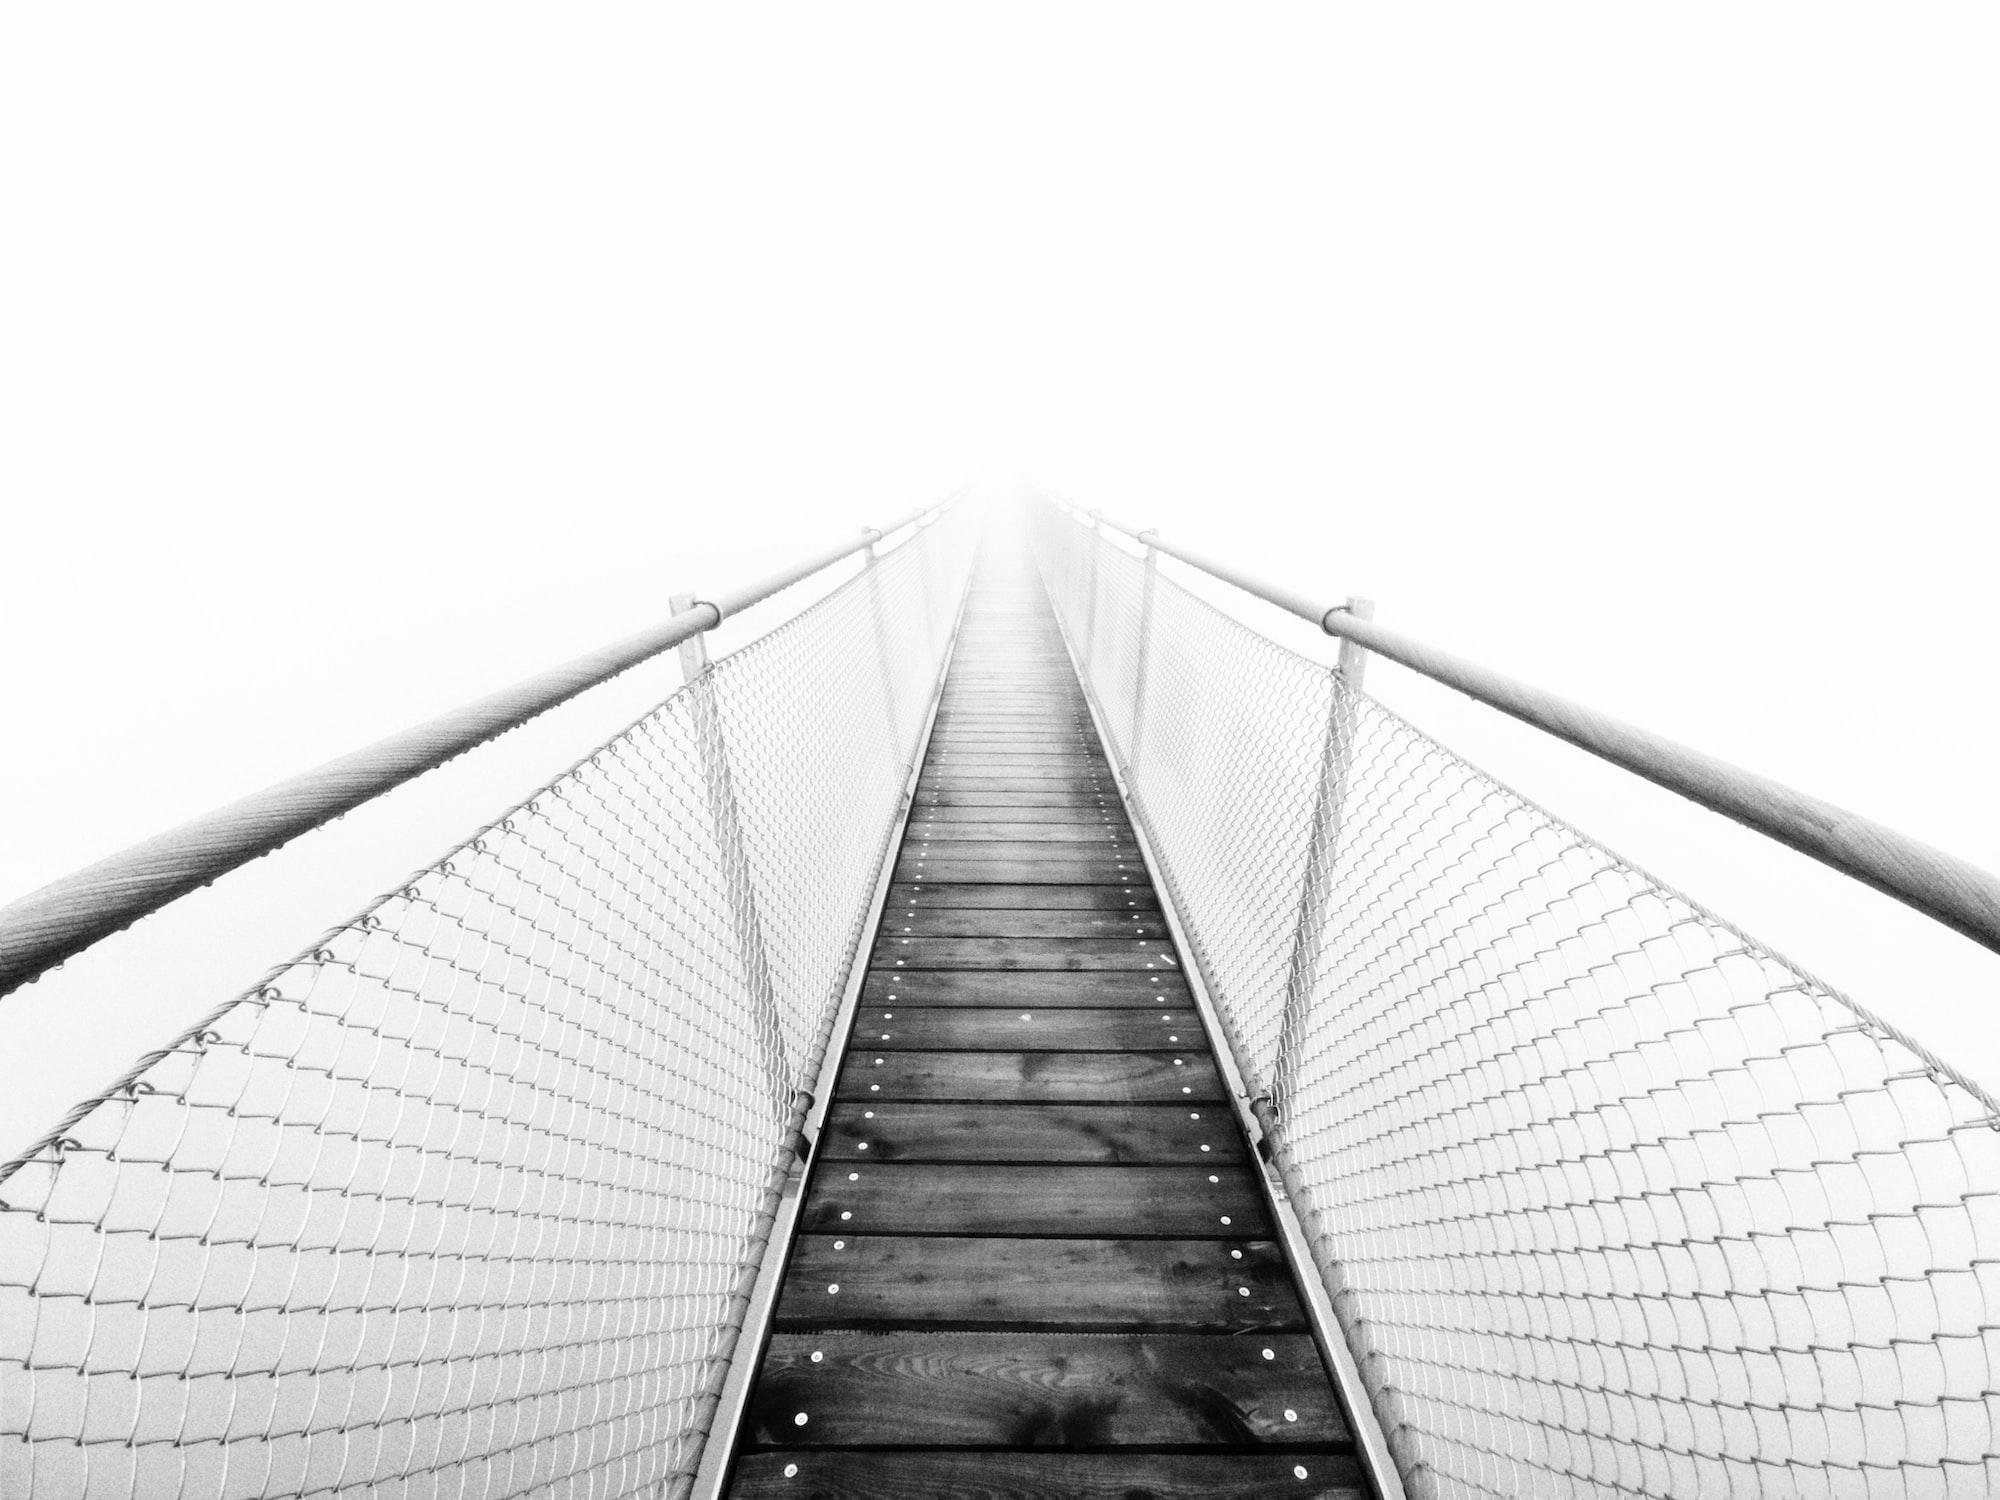 Bridge in the sky 🌉